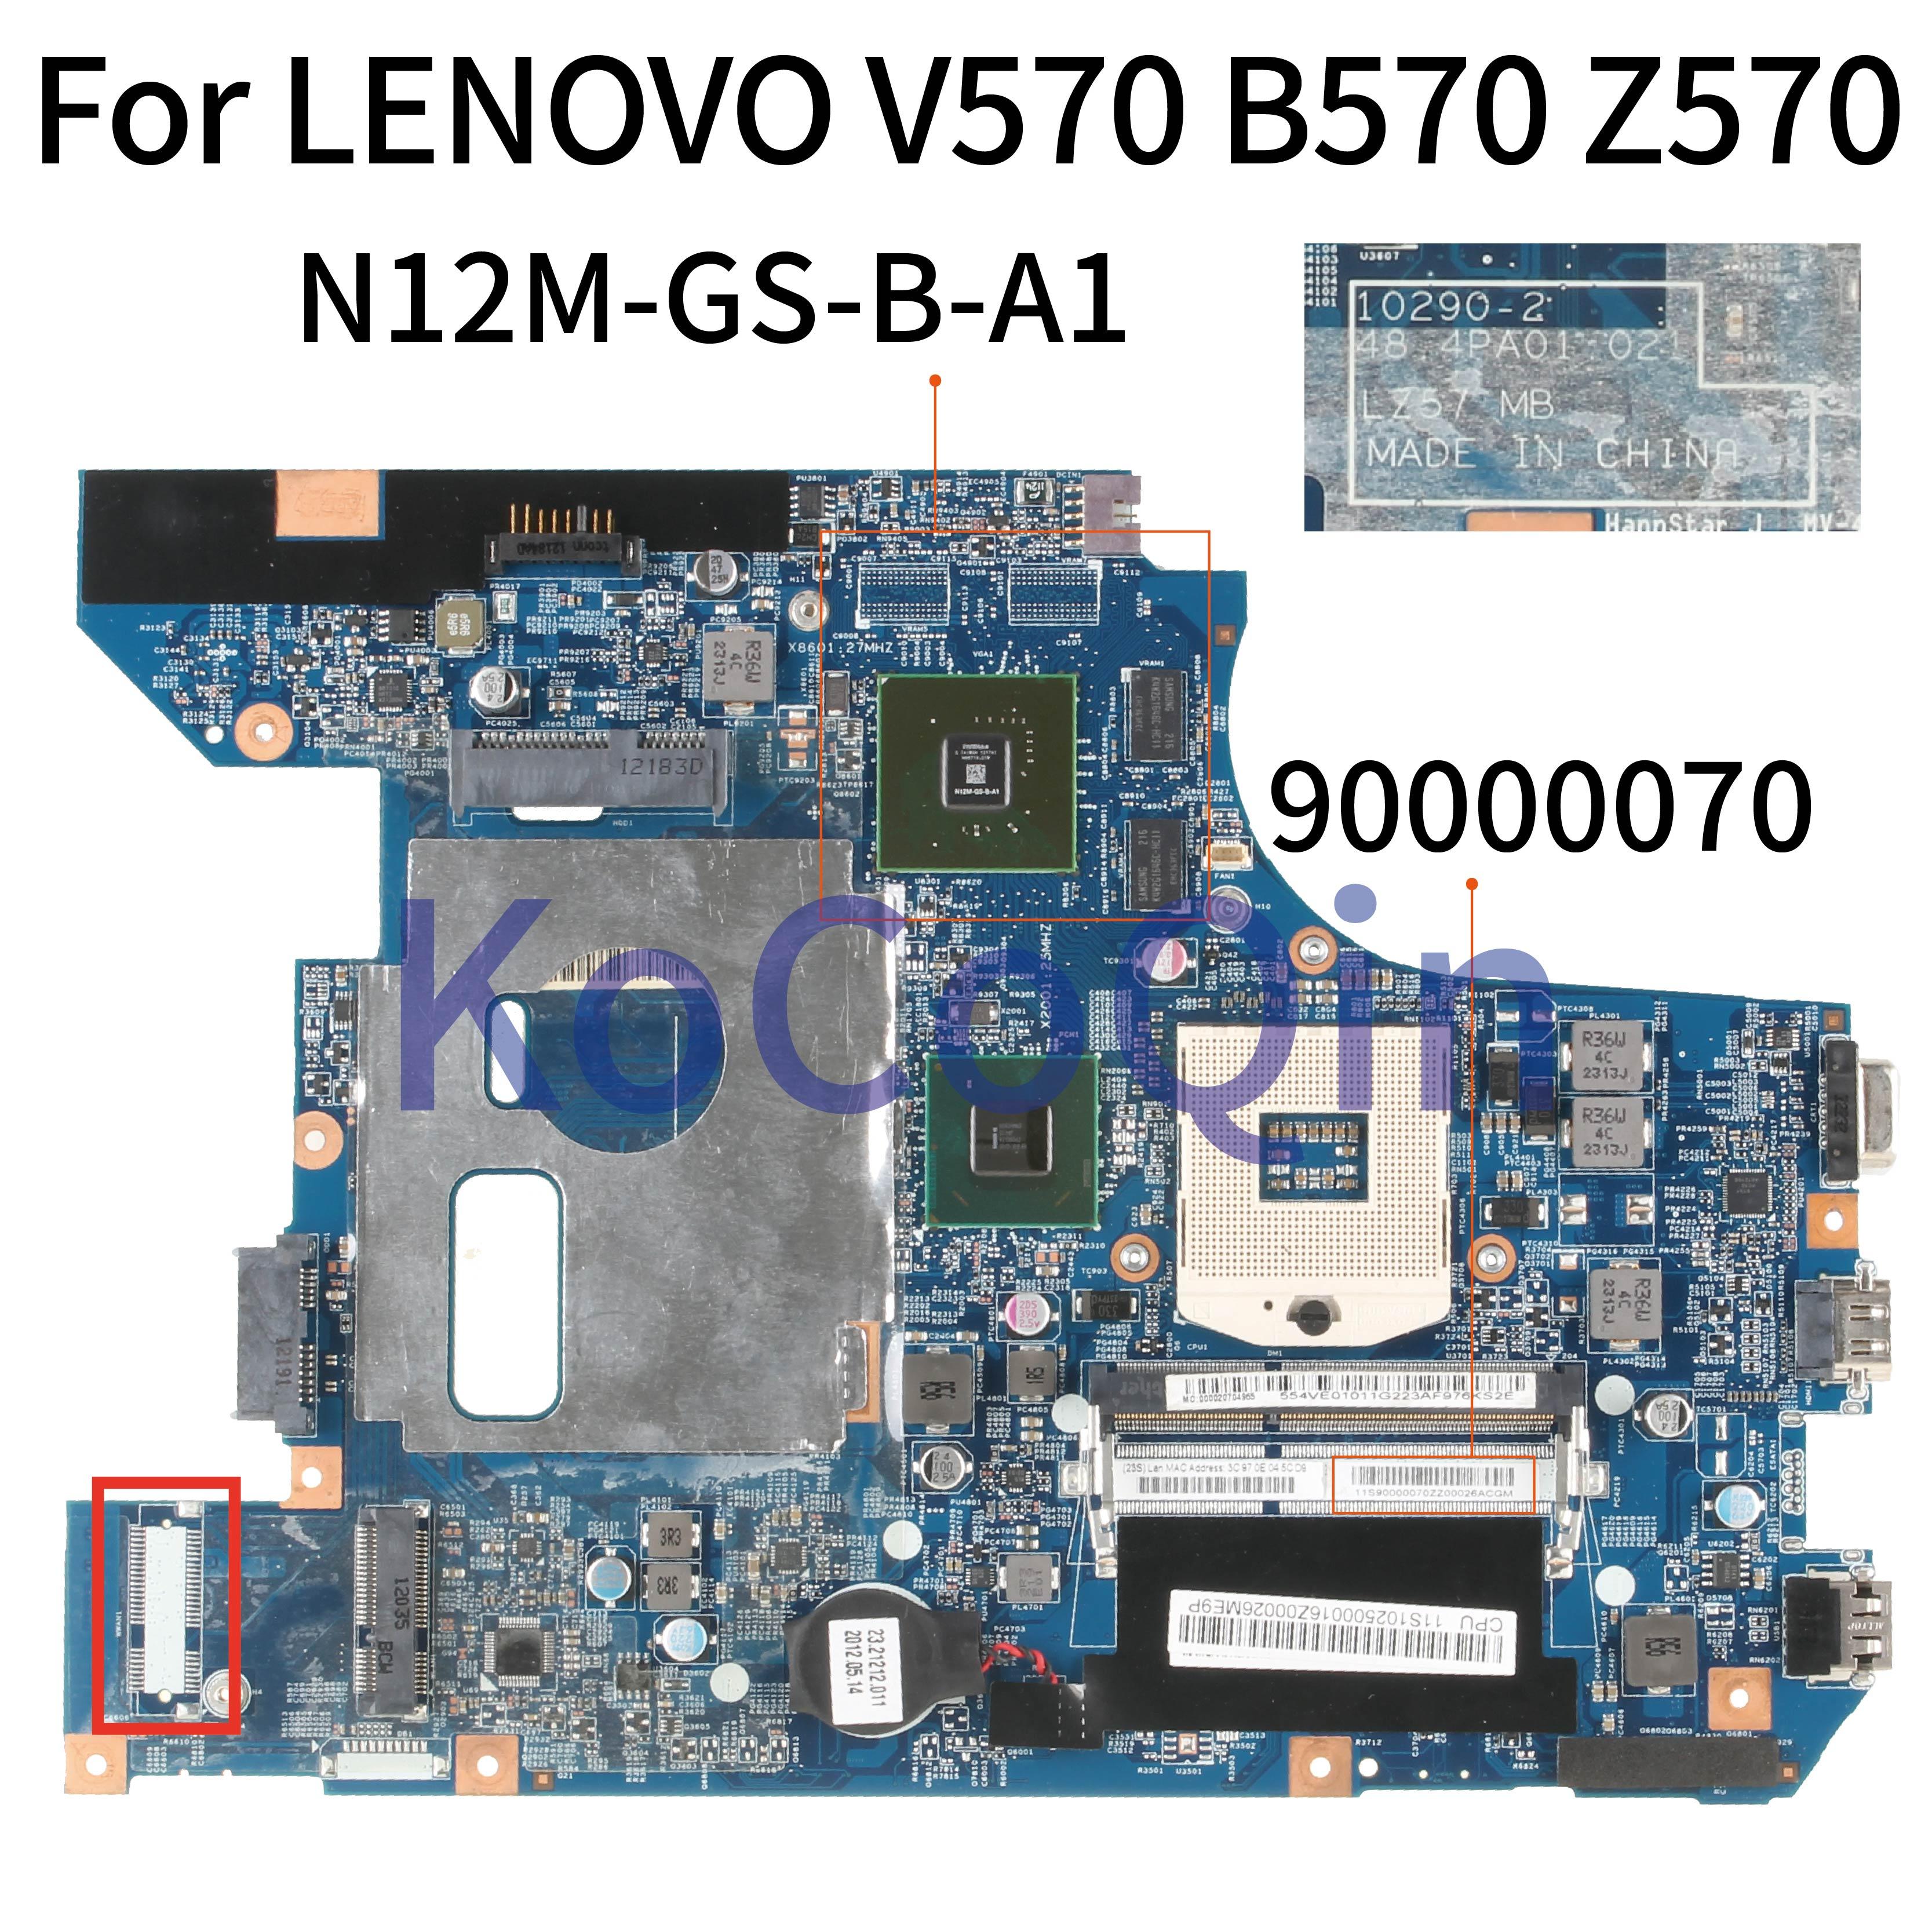 KoCoQin اللوحة المحمول لينوفو B570 B570E HM65 اللوحة 90000070 10290-2 48.4PA01.021 LZ57 N12M-GS-B-A1